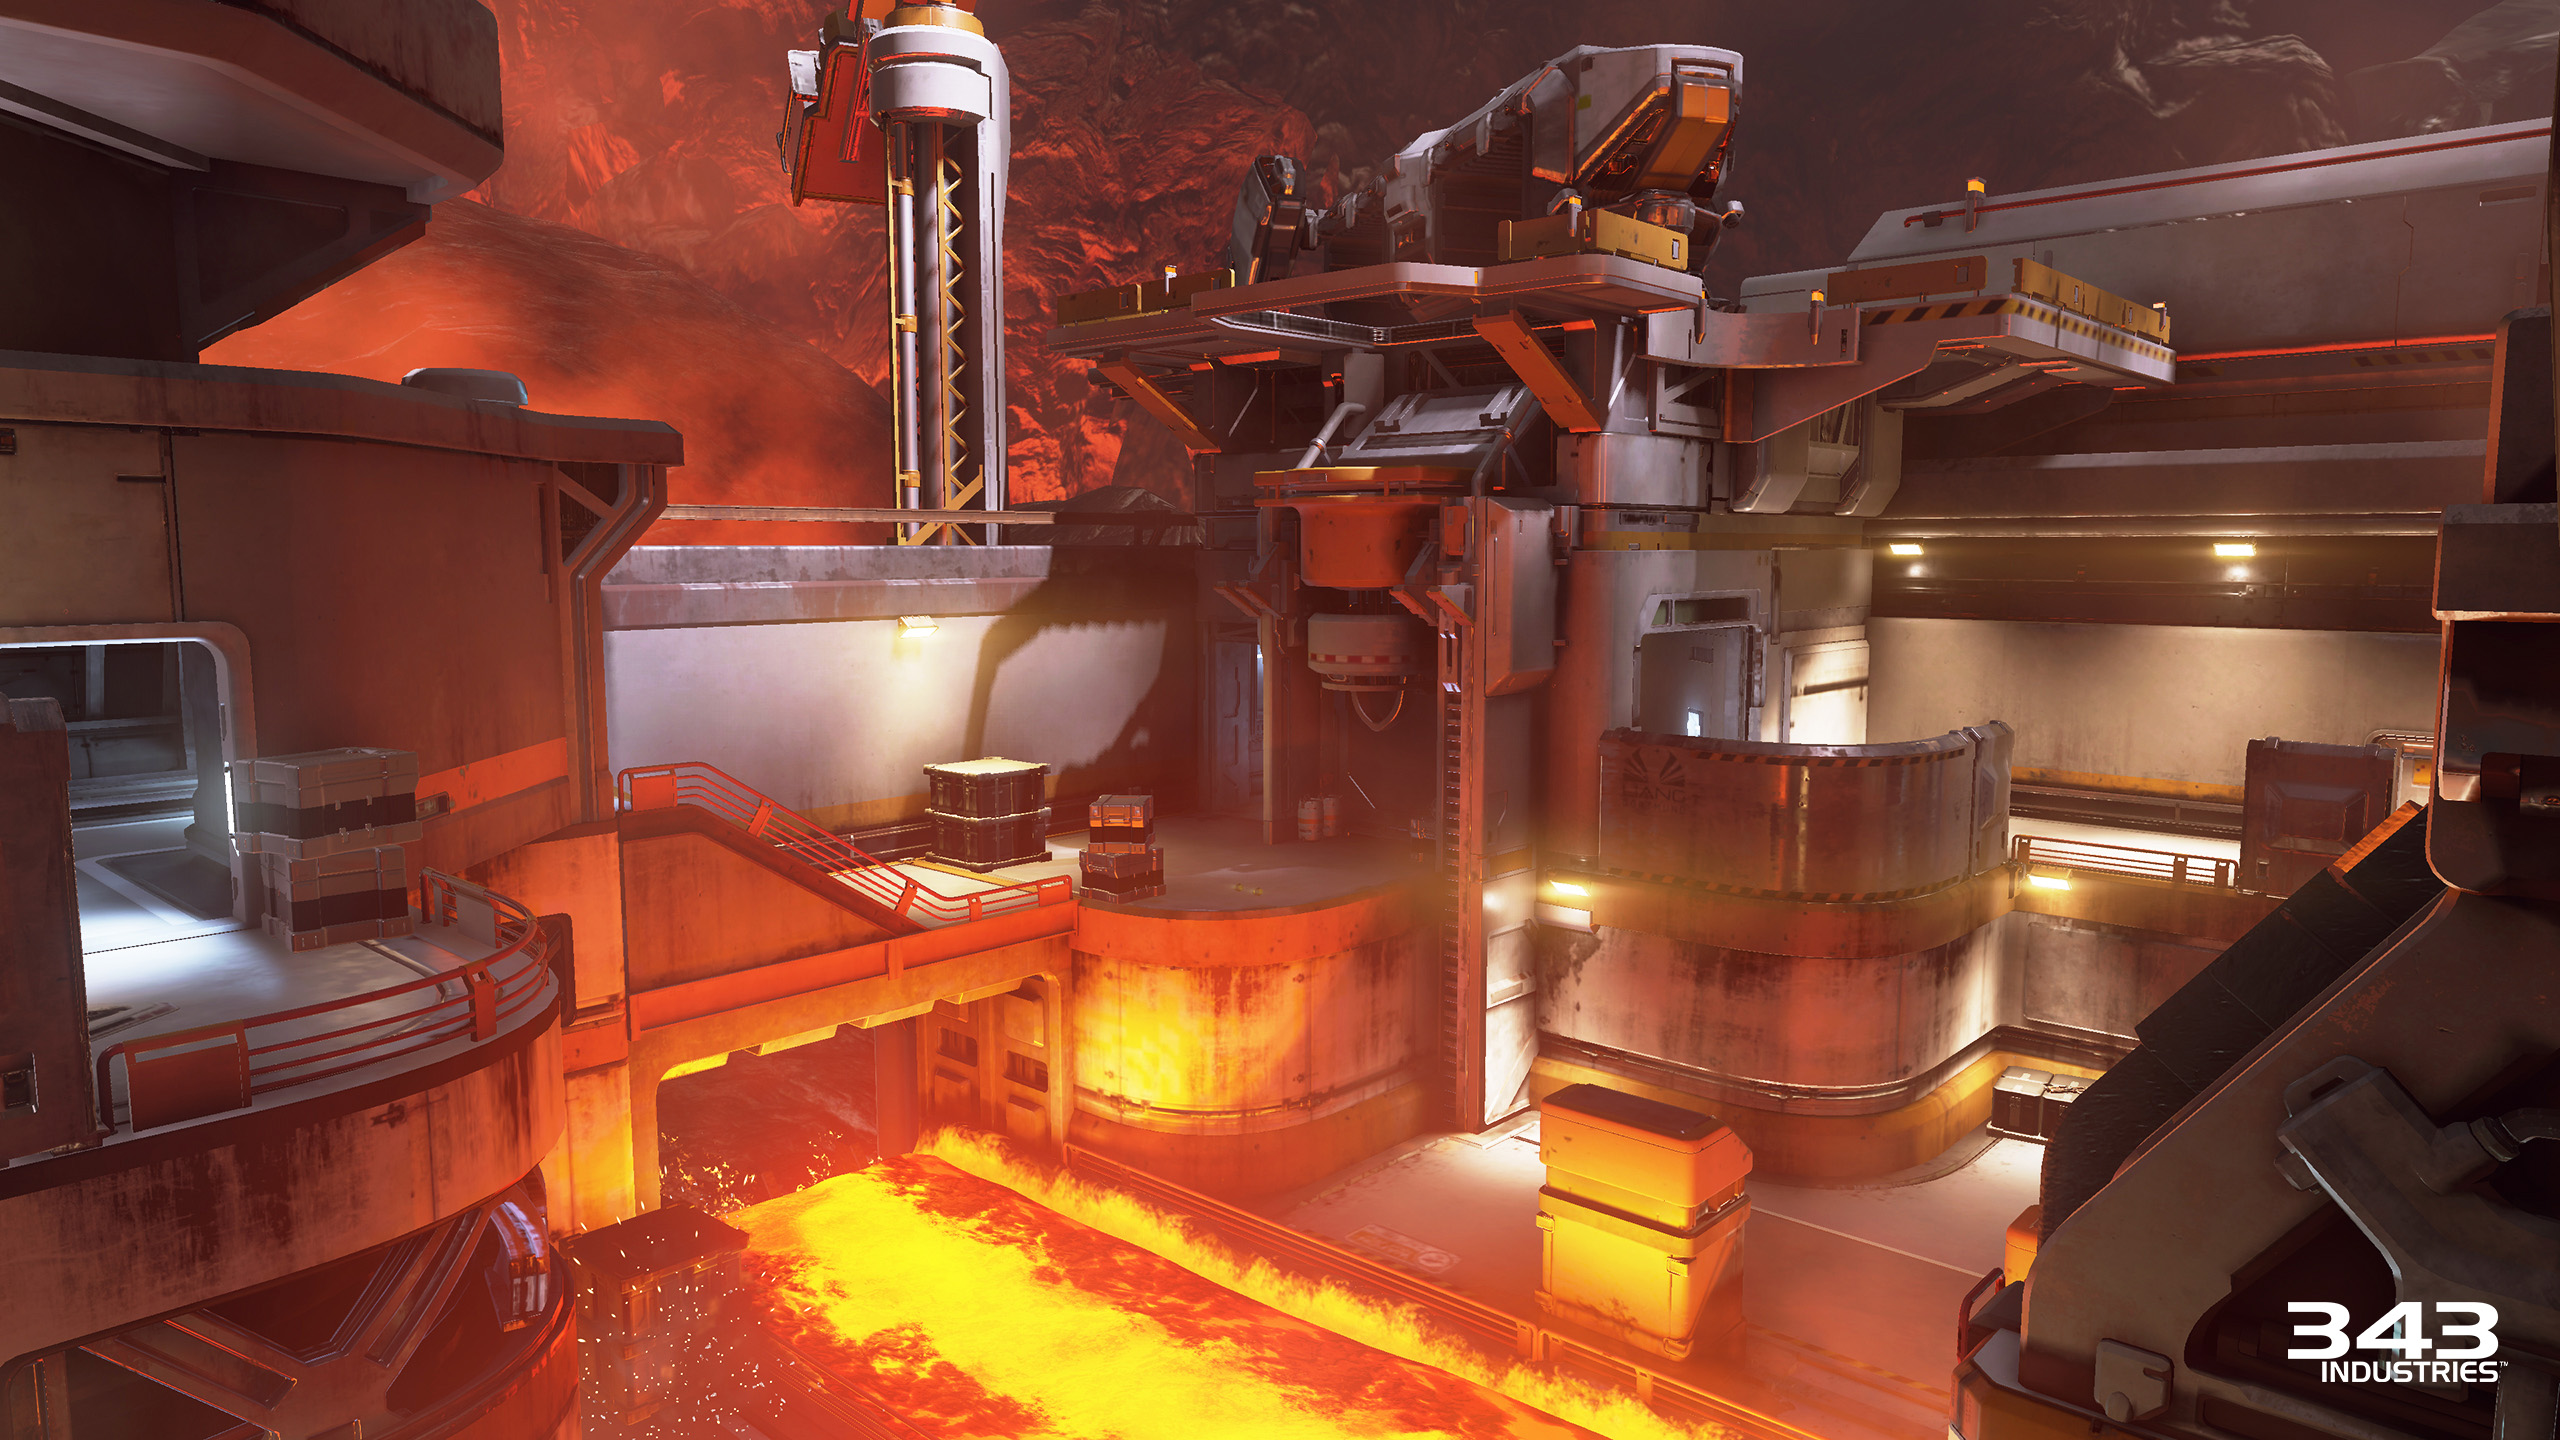 Halo 5 Guardians Arena Molten Lava